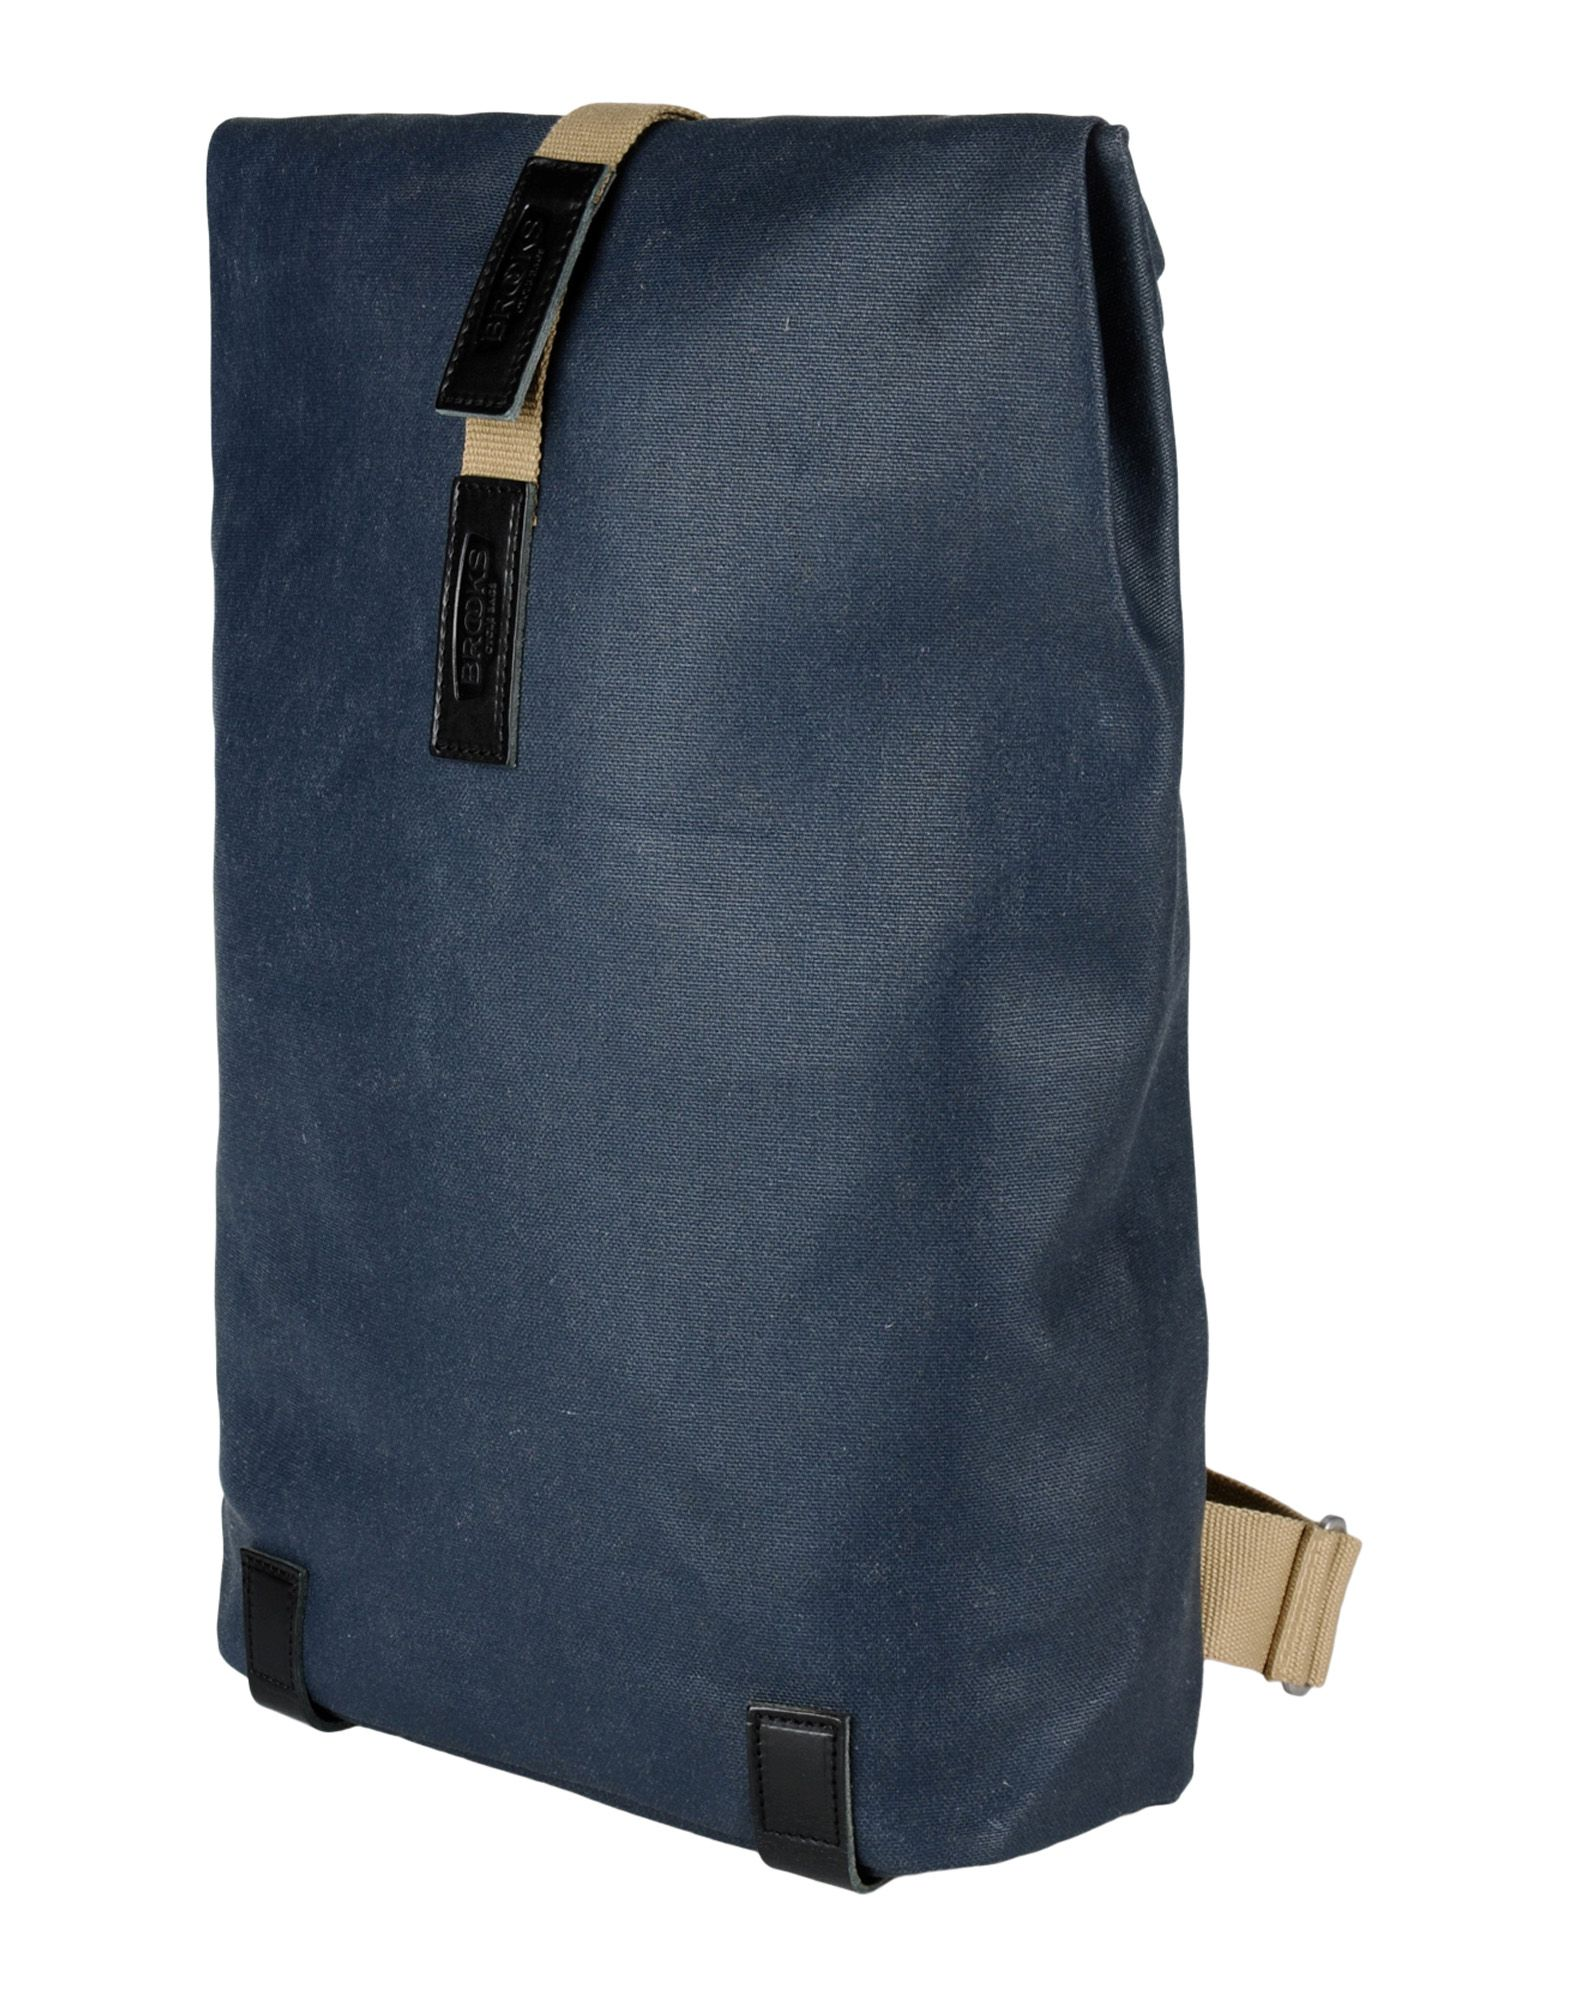 BROOKS ENGLAND Backpack & Fanny Pack in Dark Blue